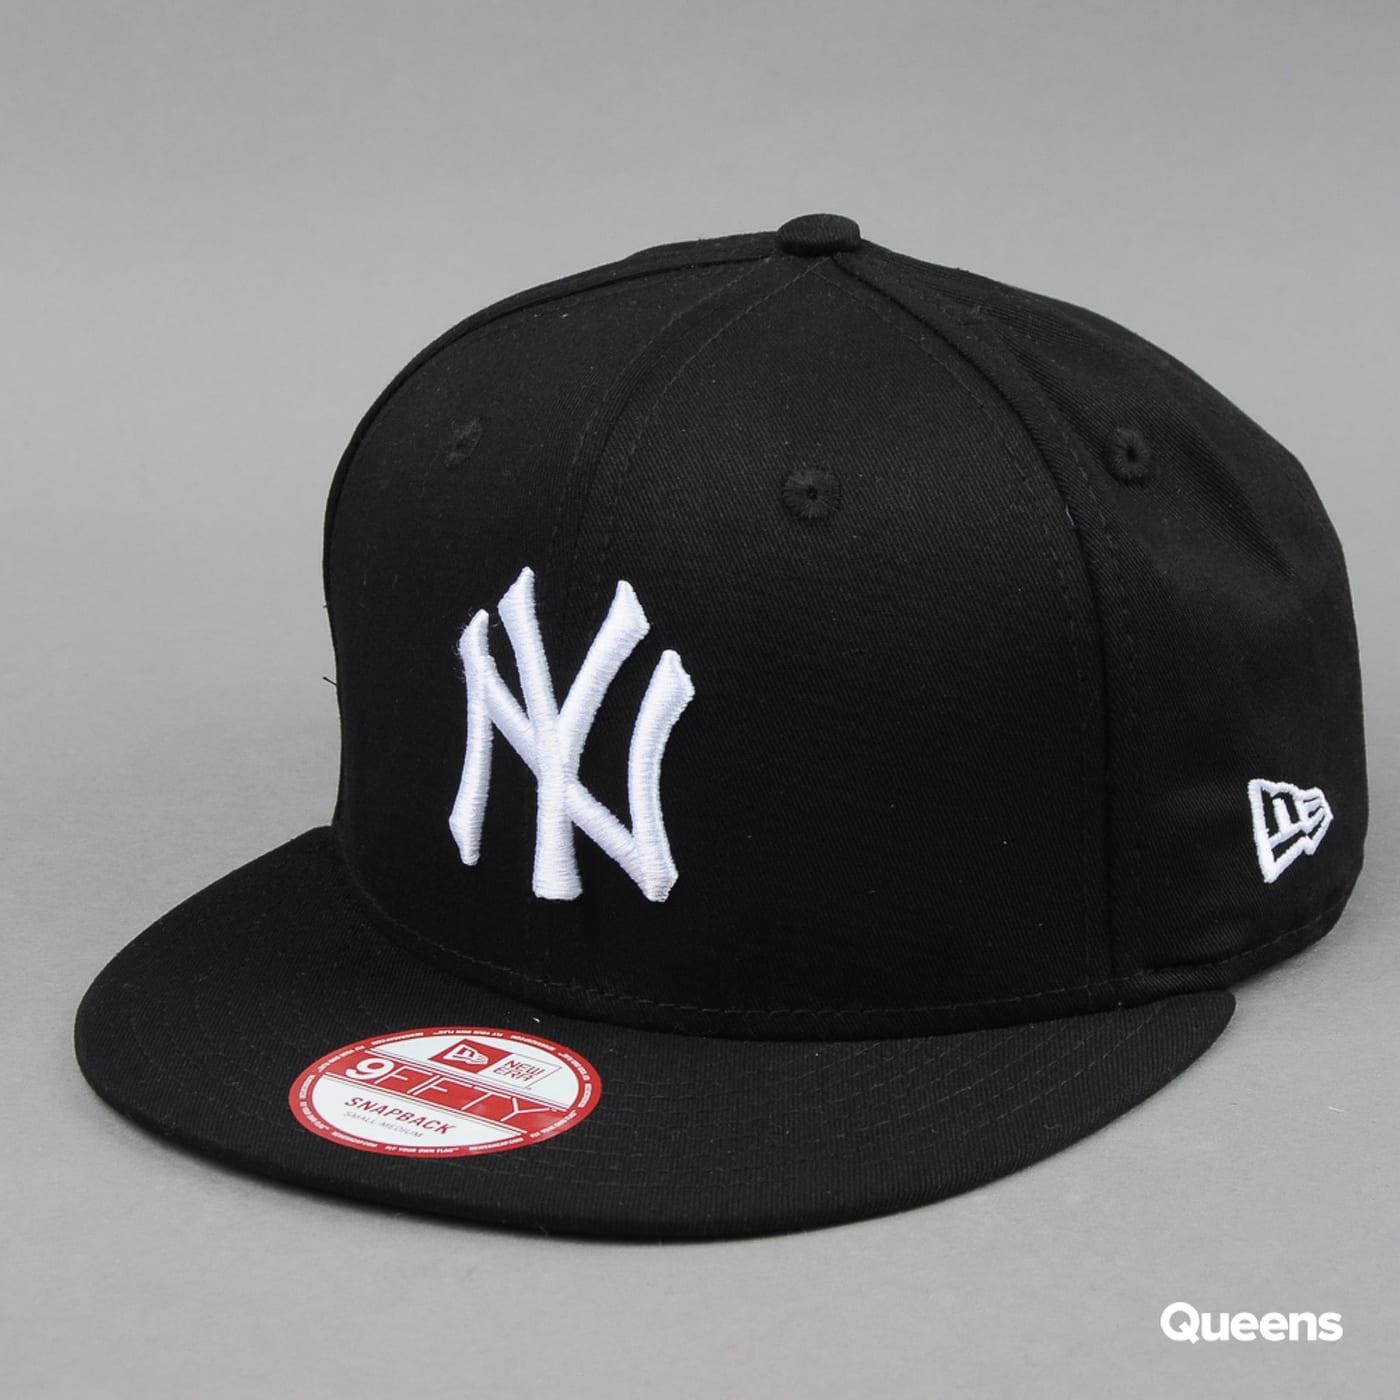 New Era 950 MLB NY black / white